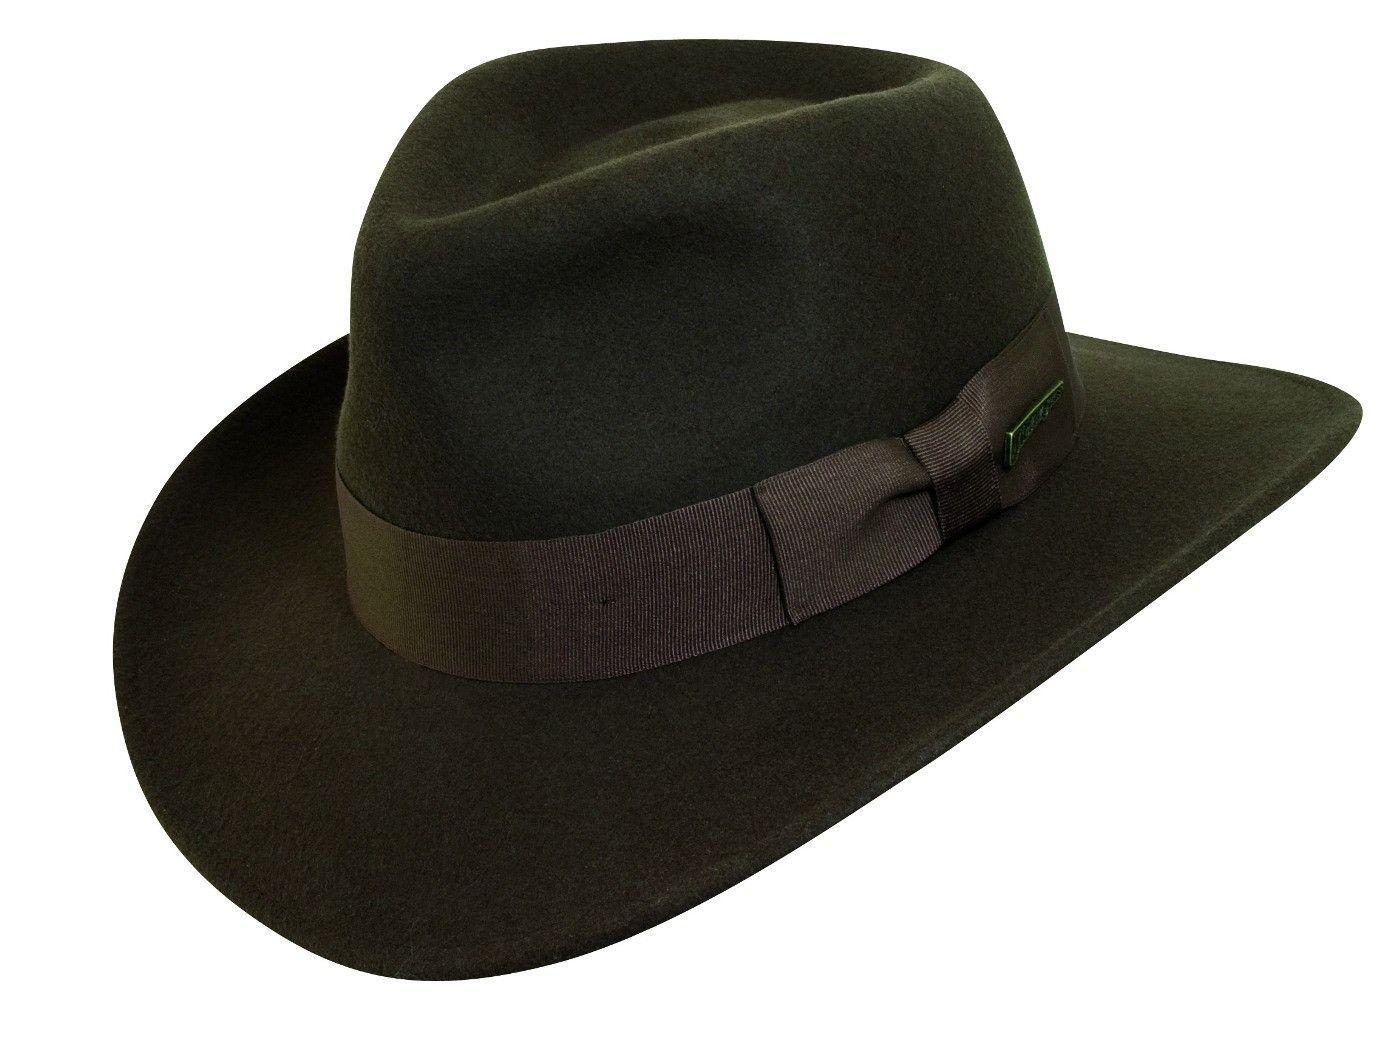 1a3c6f9fe955e Dorfman Pacific Men s Indiana Jones Wool Felt Crushable Outback Hat